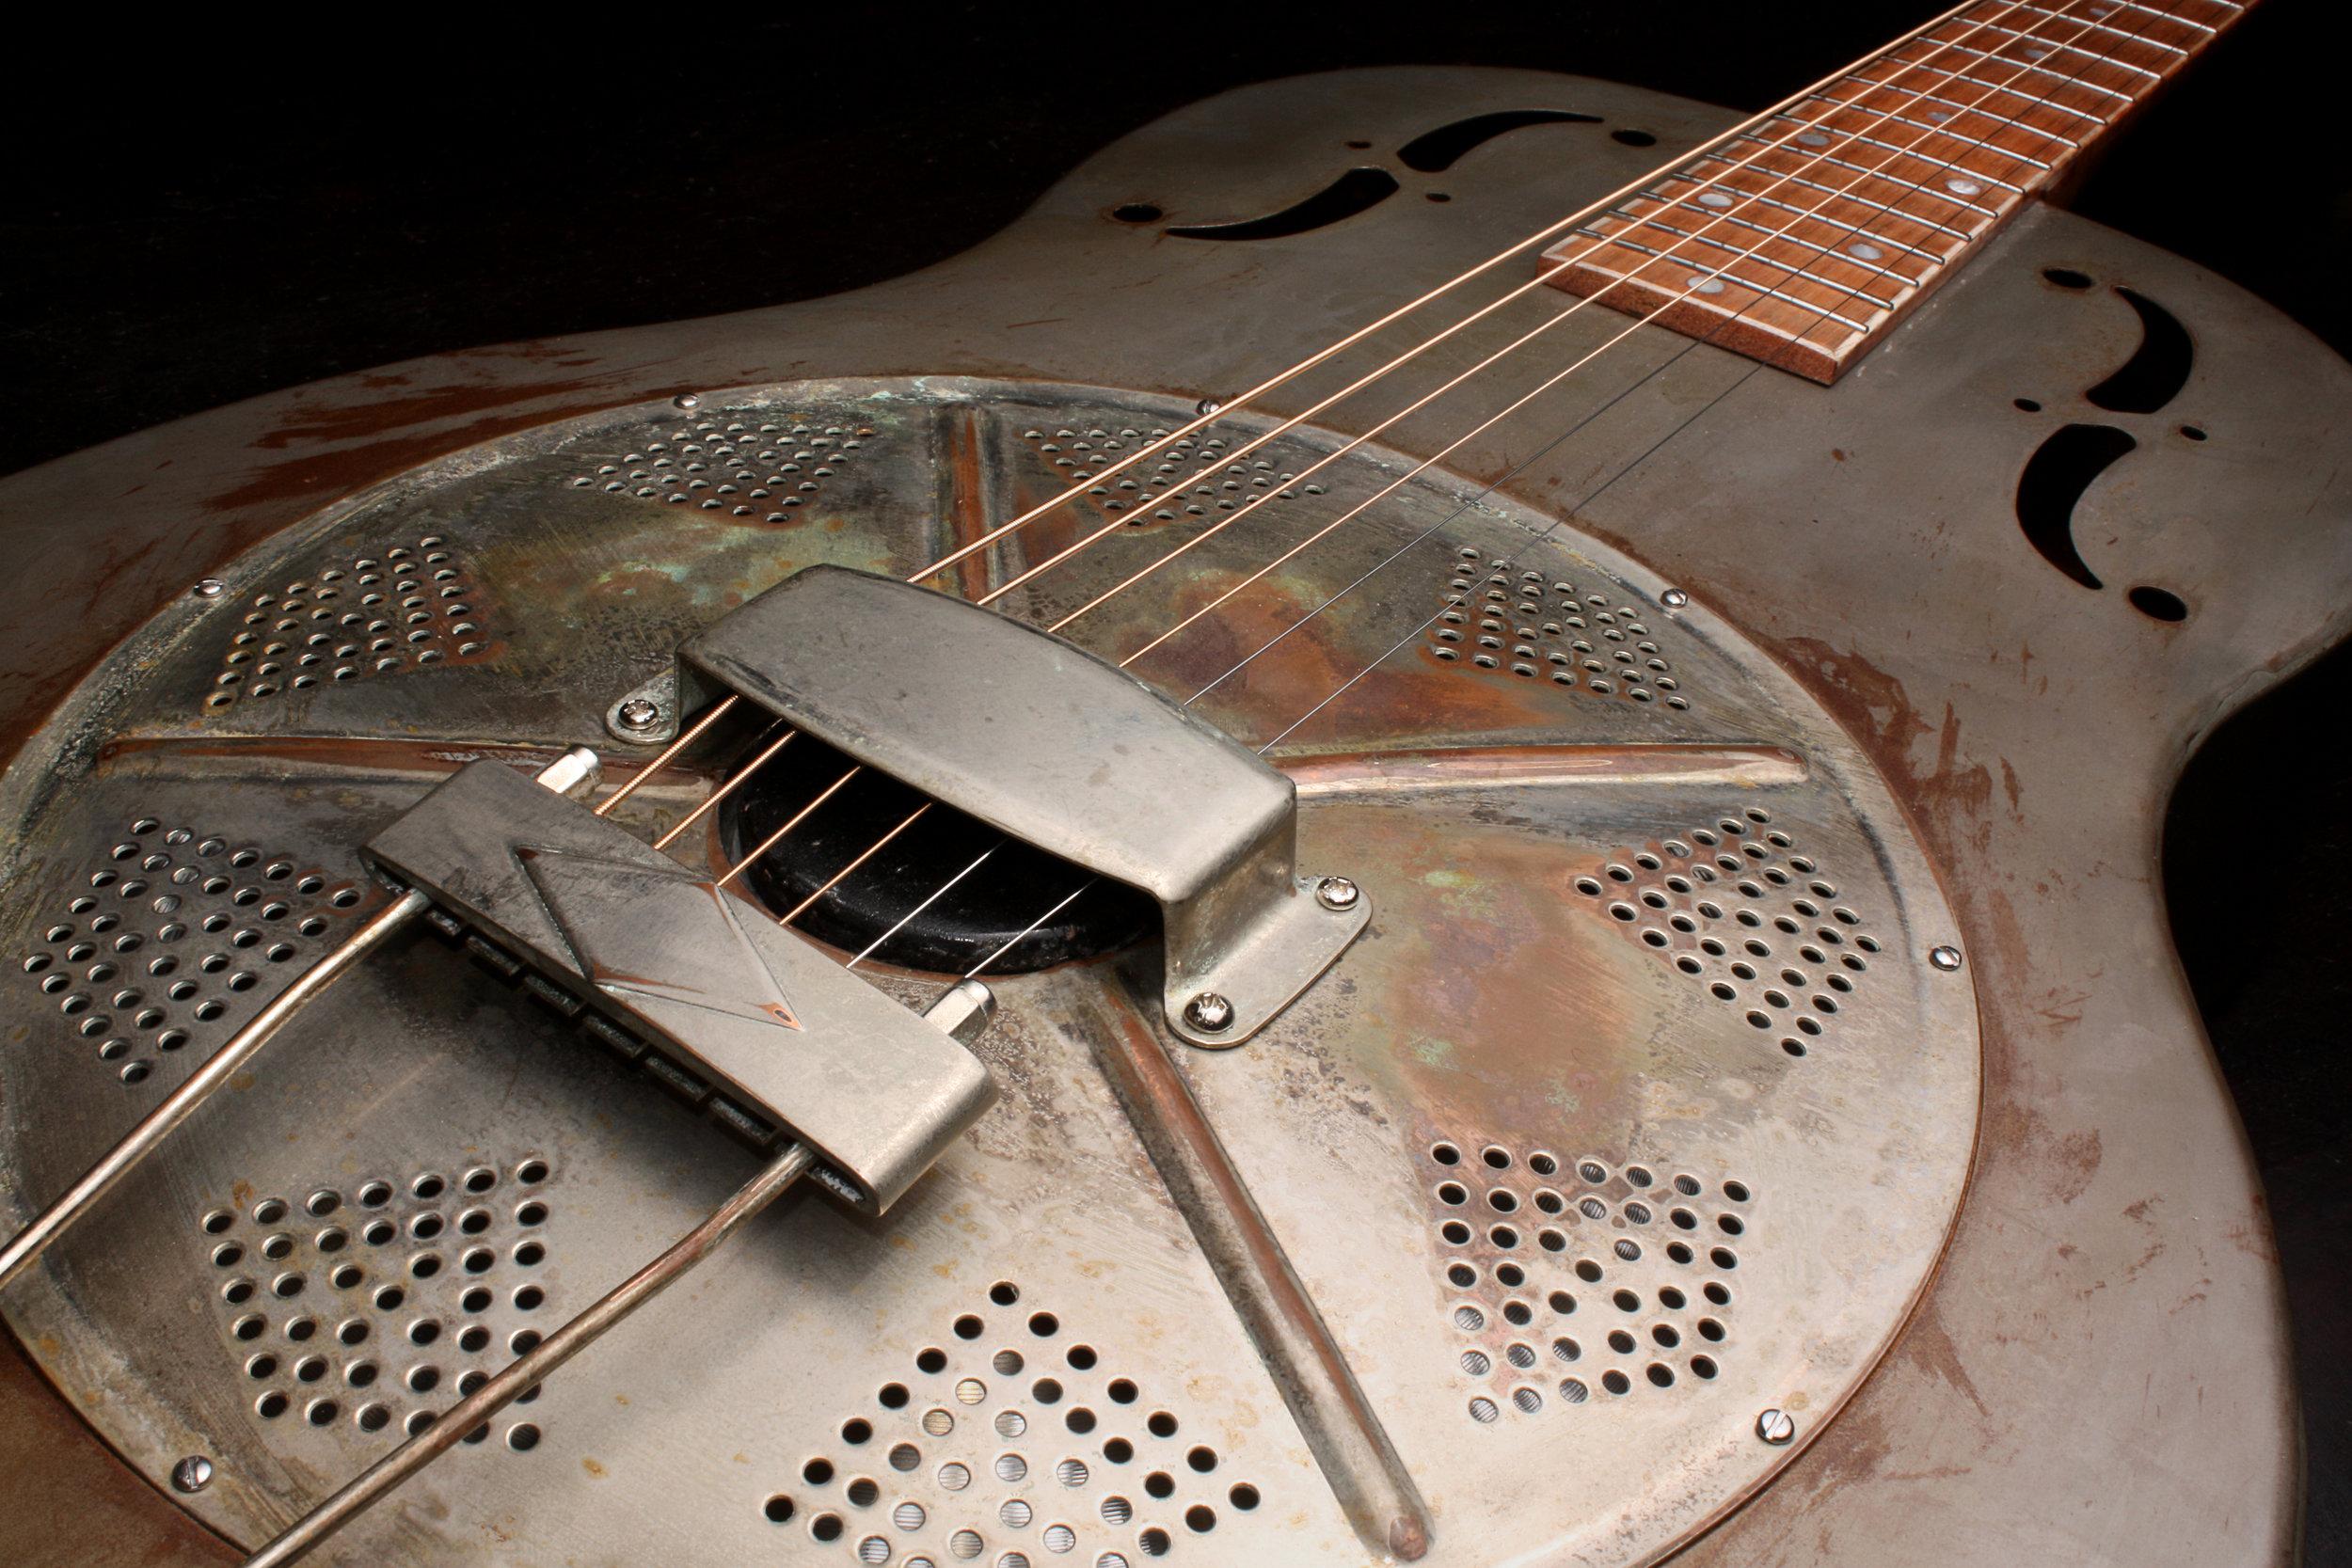 A steel resonator guitar